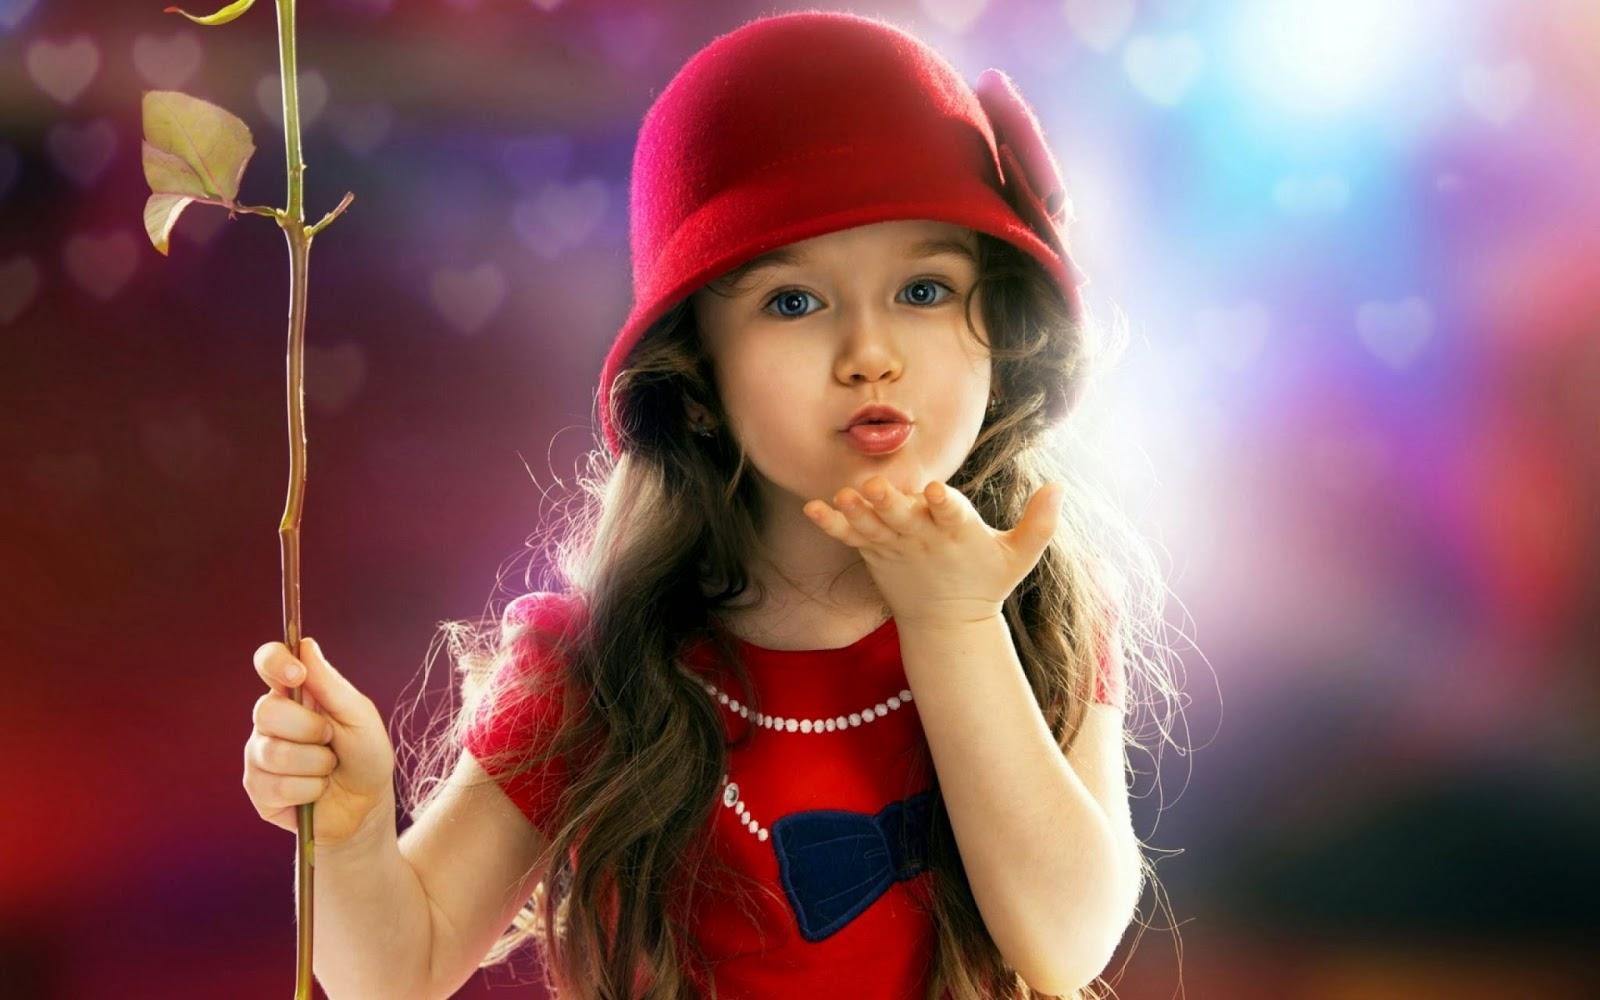 Foto bayi cantik pakai baju merah